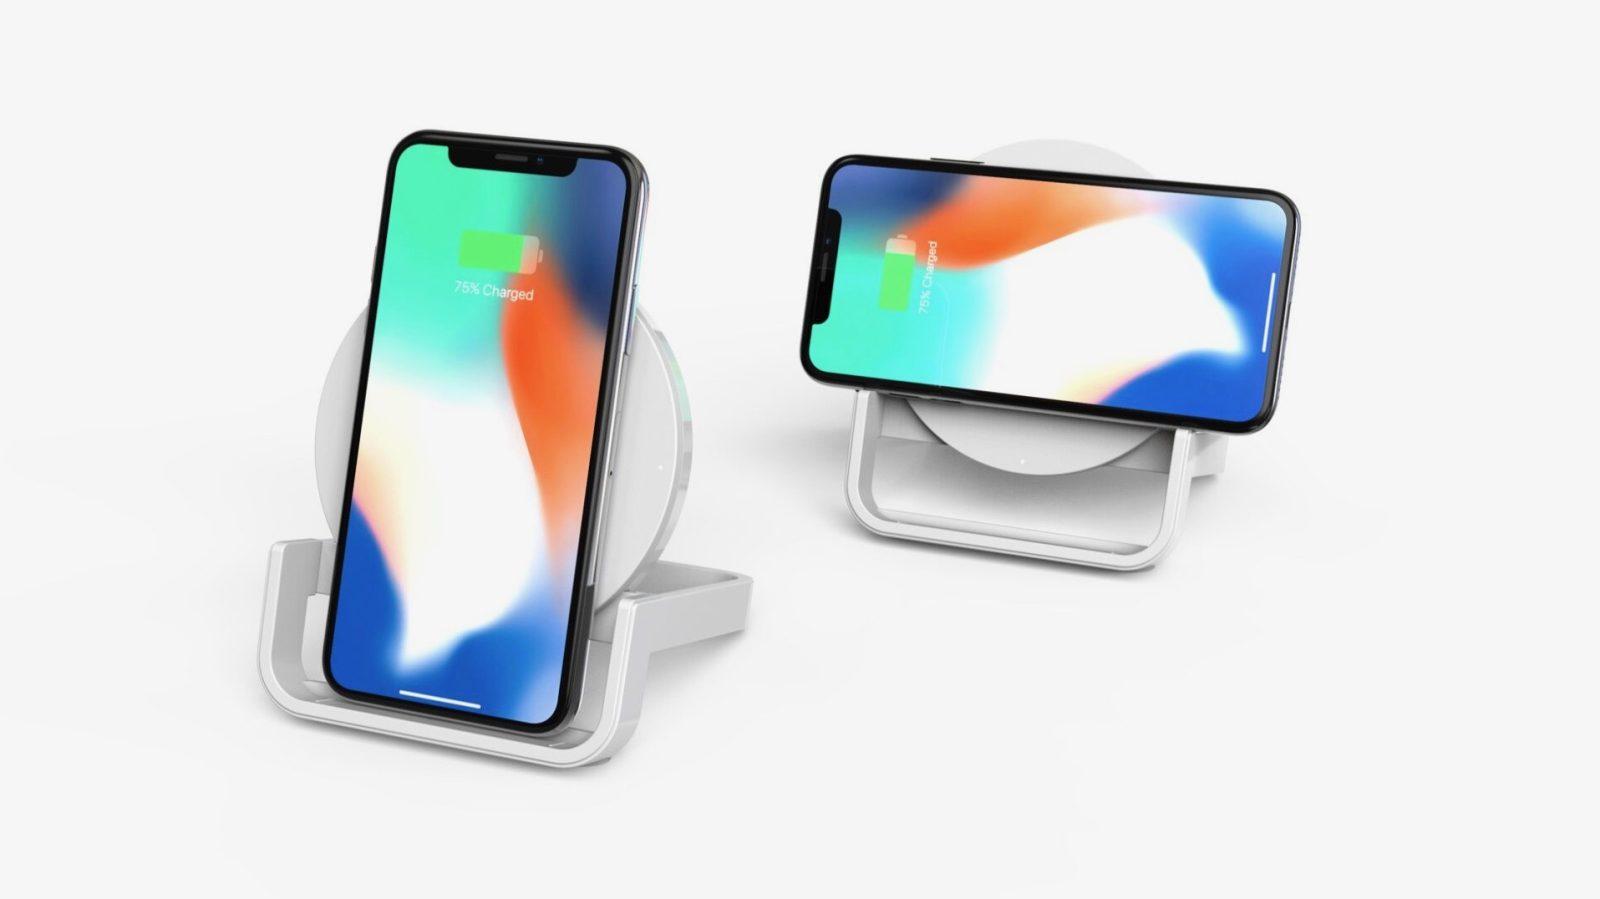 belkin boost^up wireless charging dock for iphone + apple watch amazon